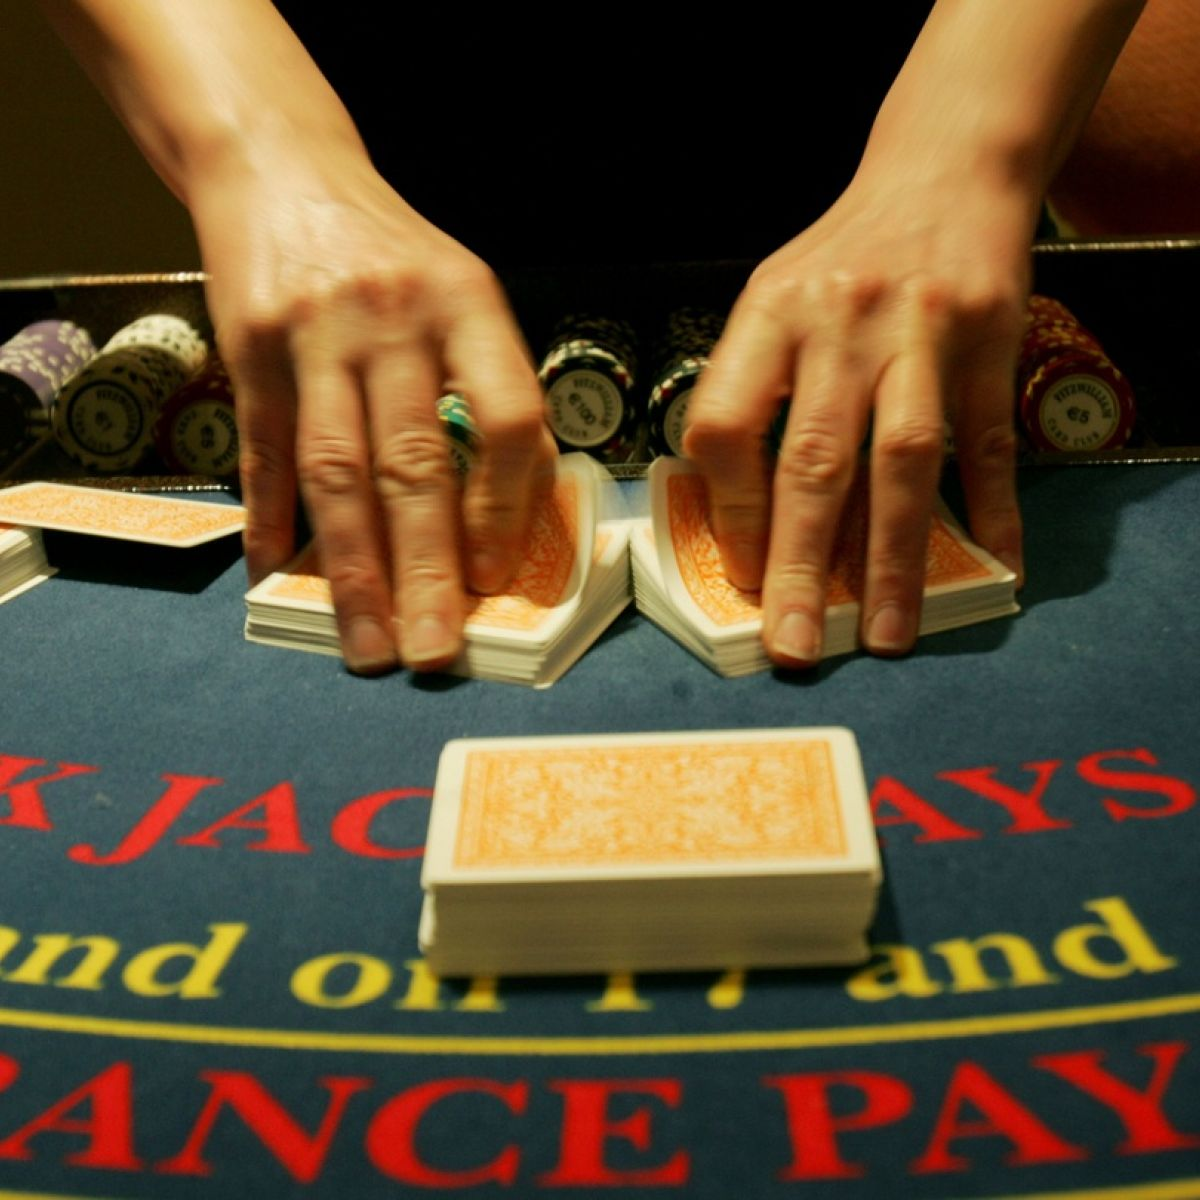 Never bust blackjack strategy